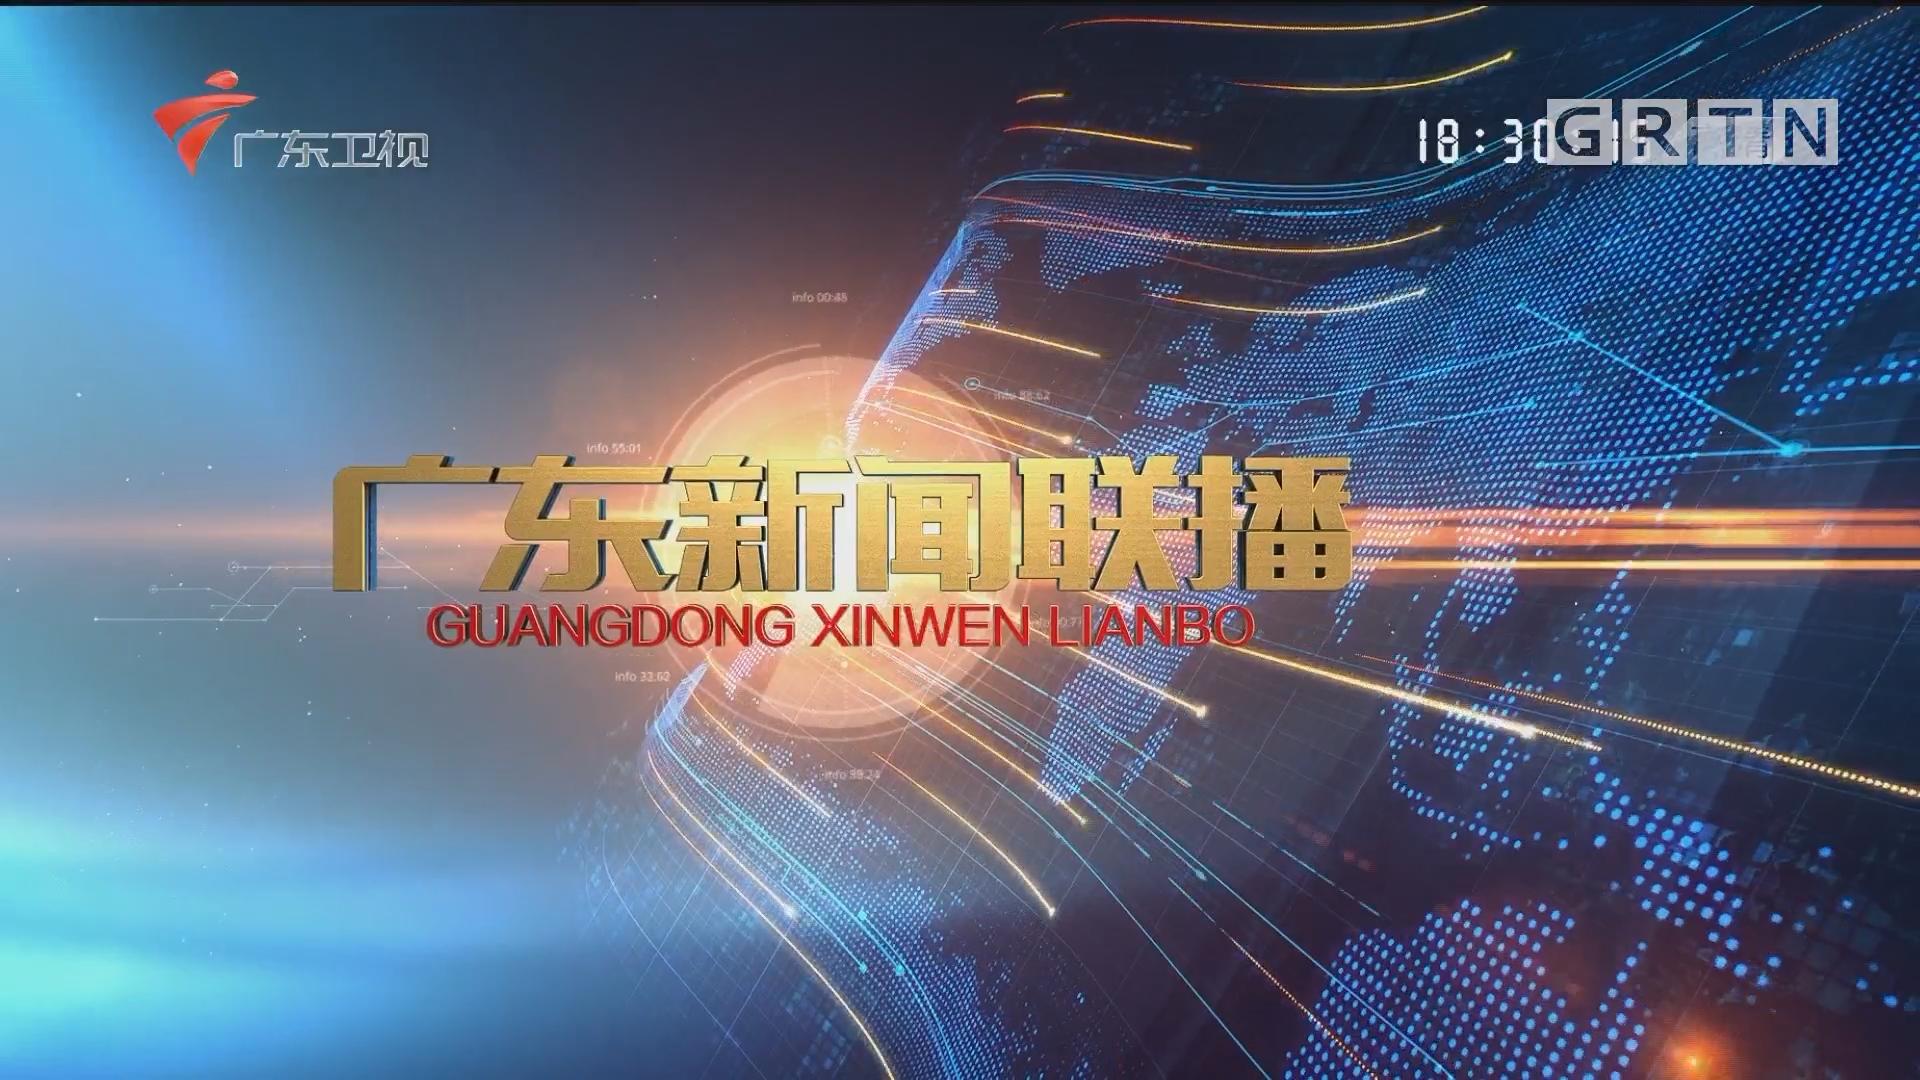 [HD][2017-09-10]广东新闻联播:云浮:文化民生编织幸福生活